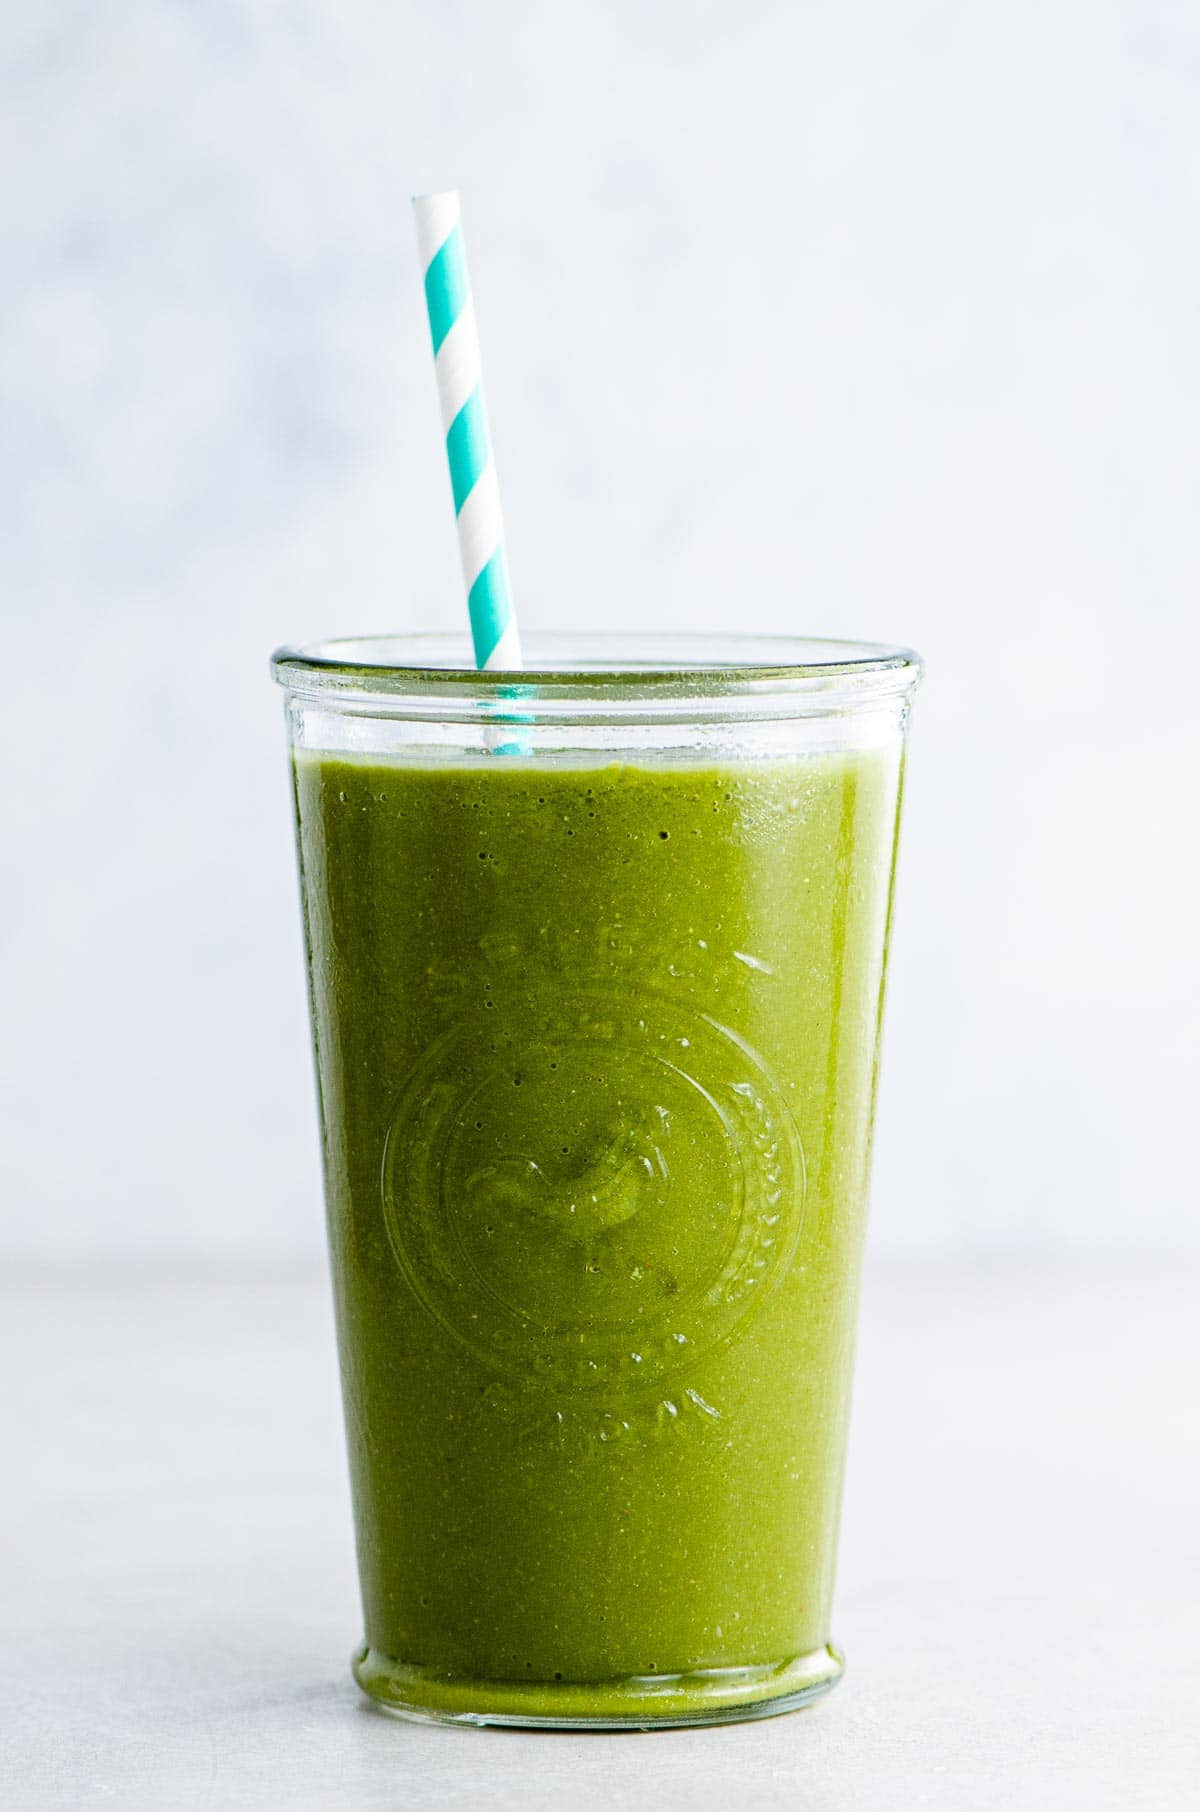 Green flavor